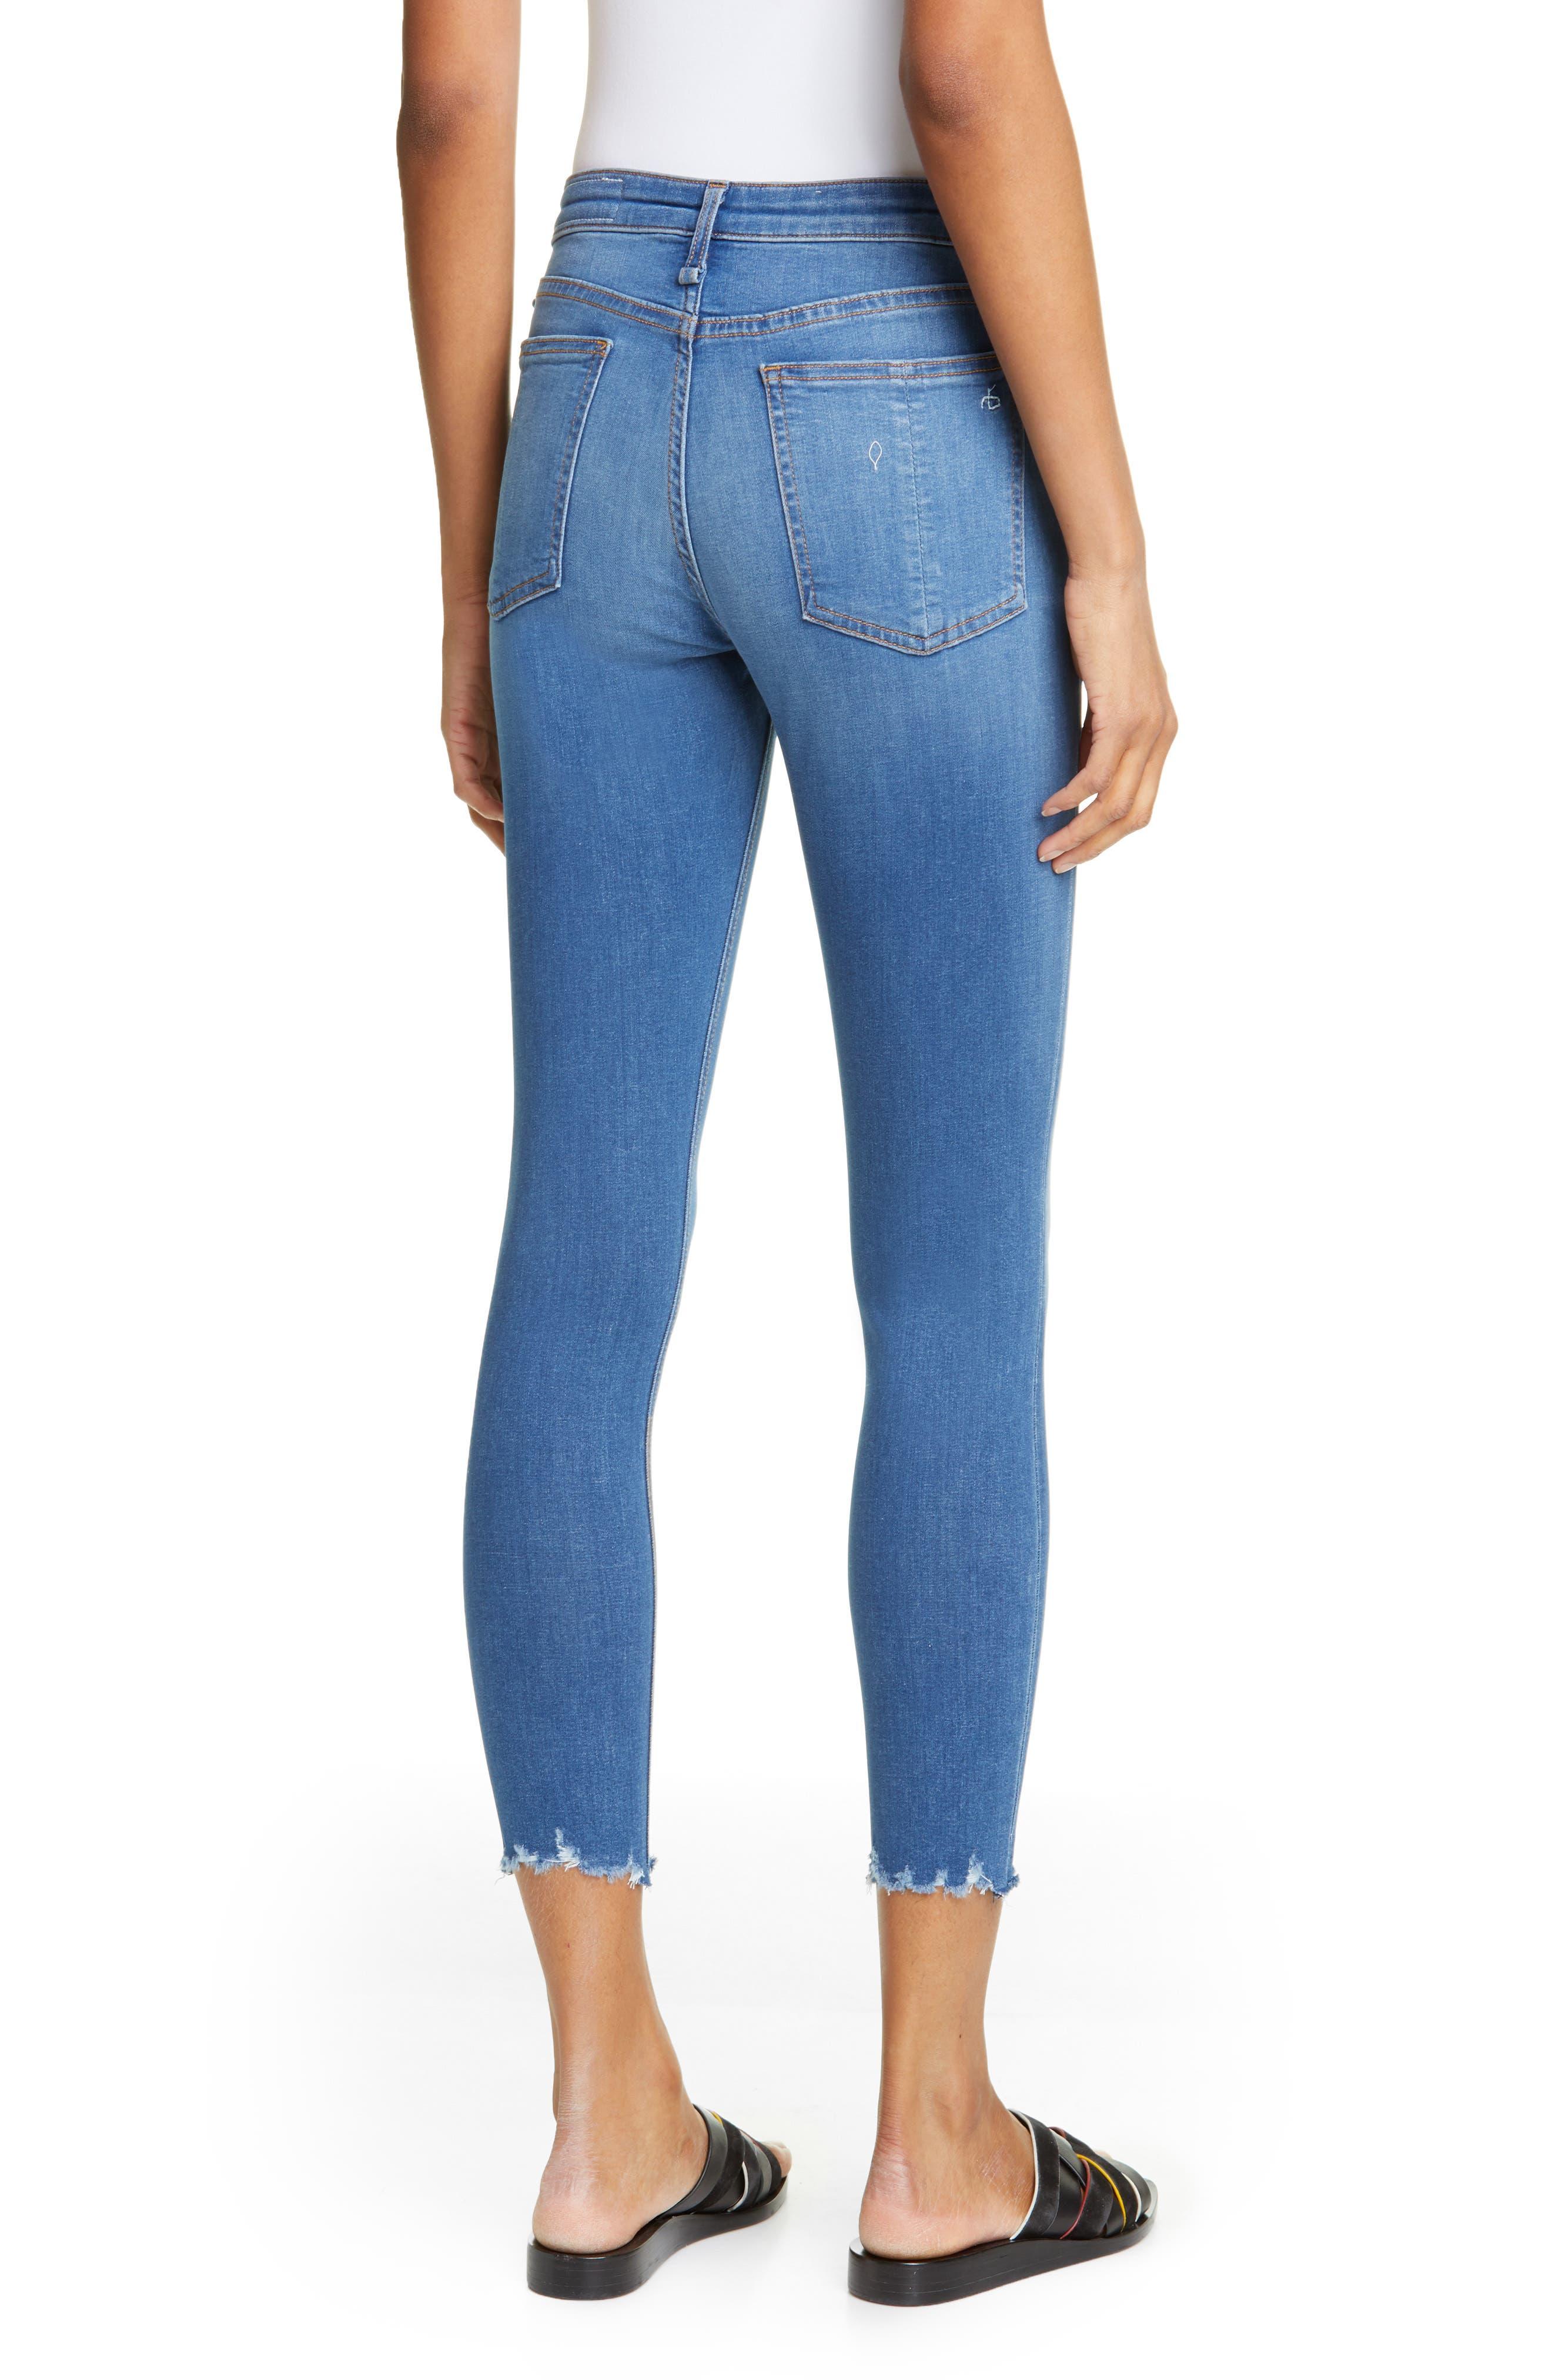 RAG & BONE, Cate High Waist Ankle Skinny Jeans, Alternate thumbnail 2, color, FLINT